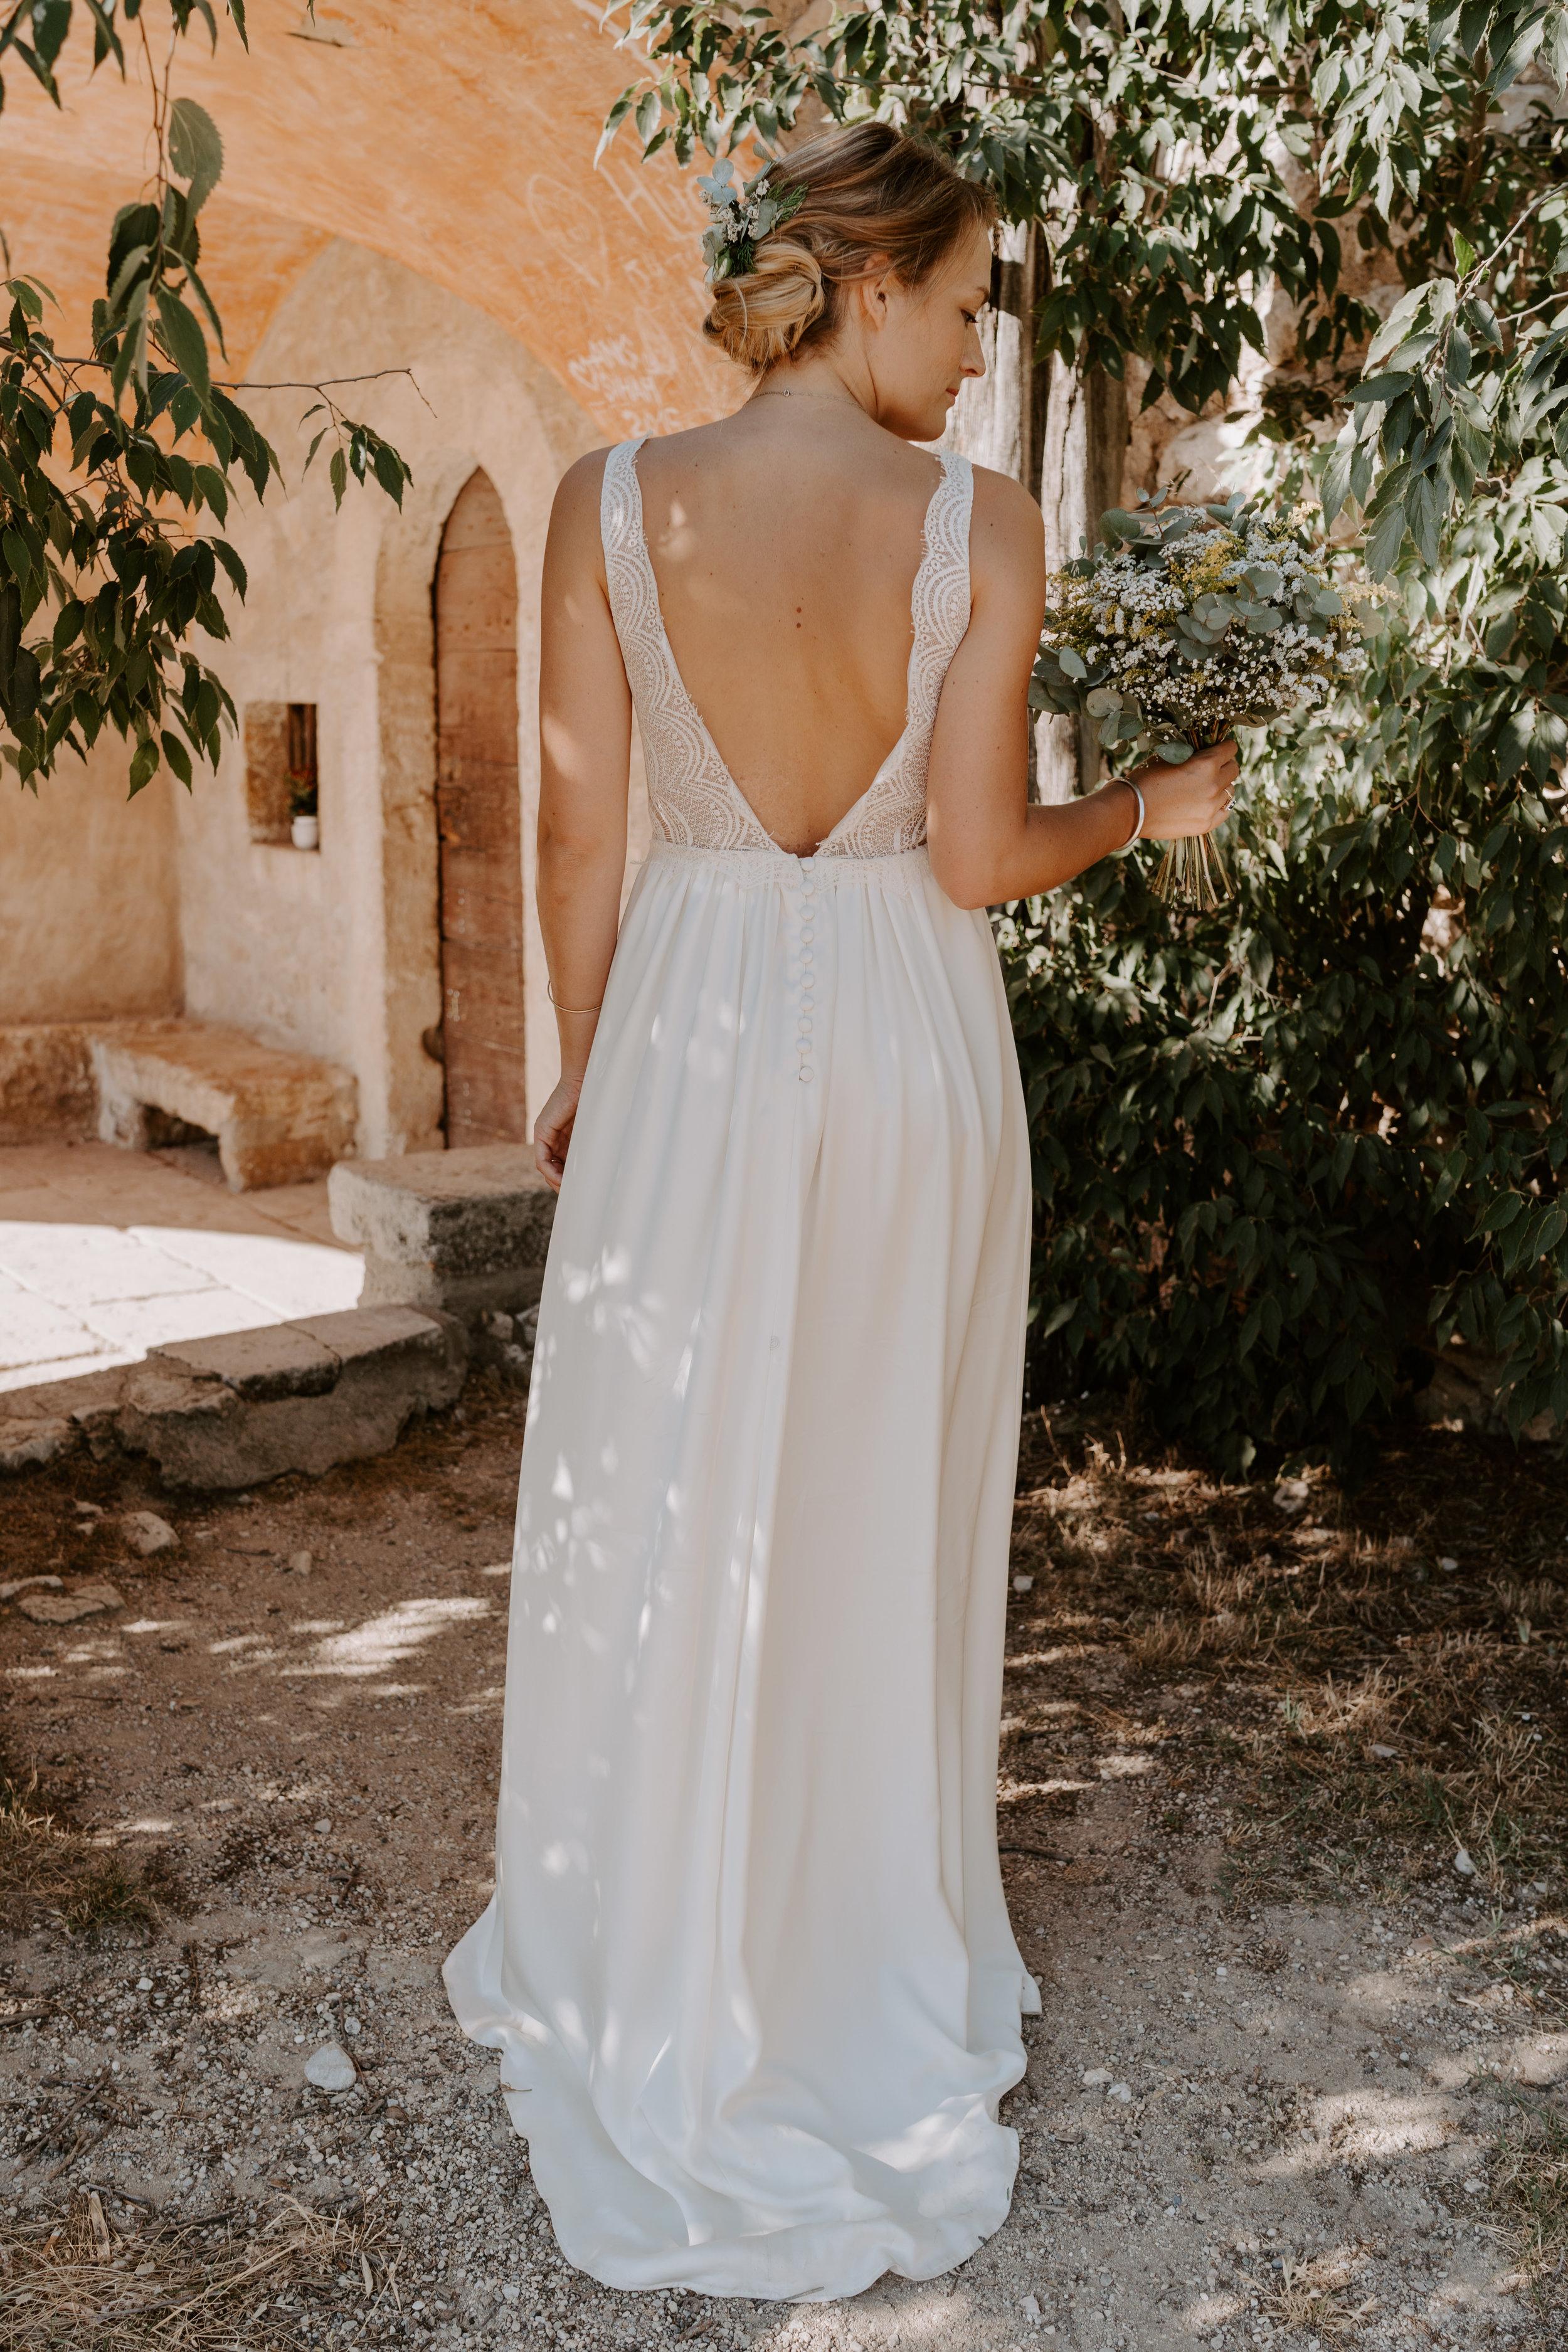 elsacaza_photographe_mariage_Juliette_Nicolas-399.jpg